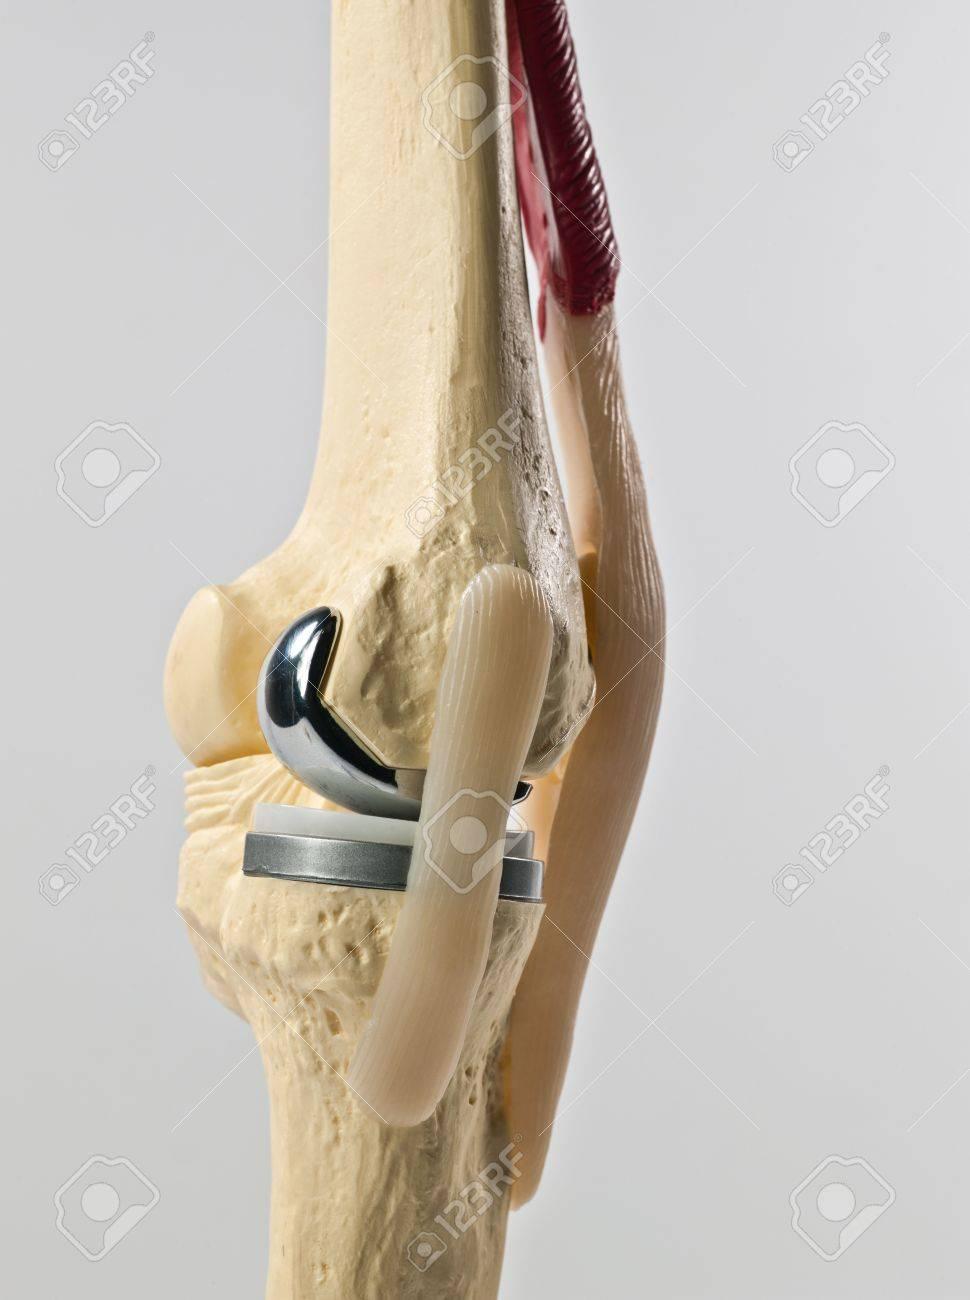 Modelo De Estudio Anatómico De Un Reemplazo De Rodilla Humana Fotos ...